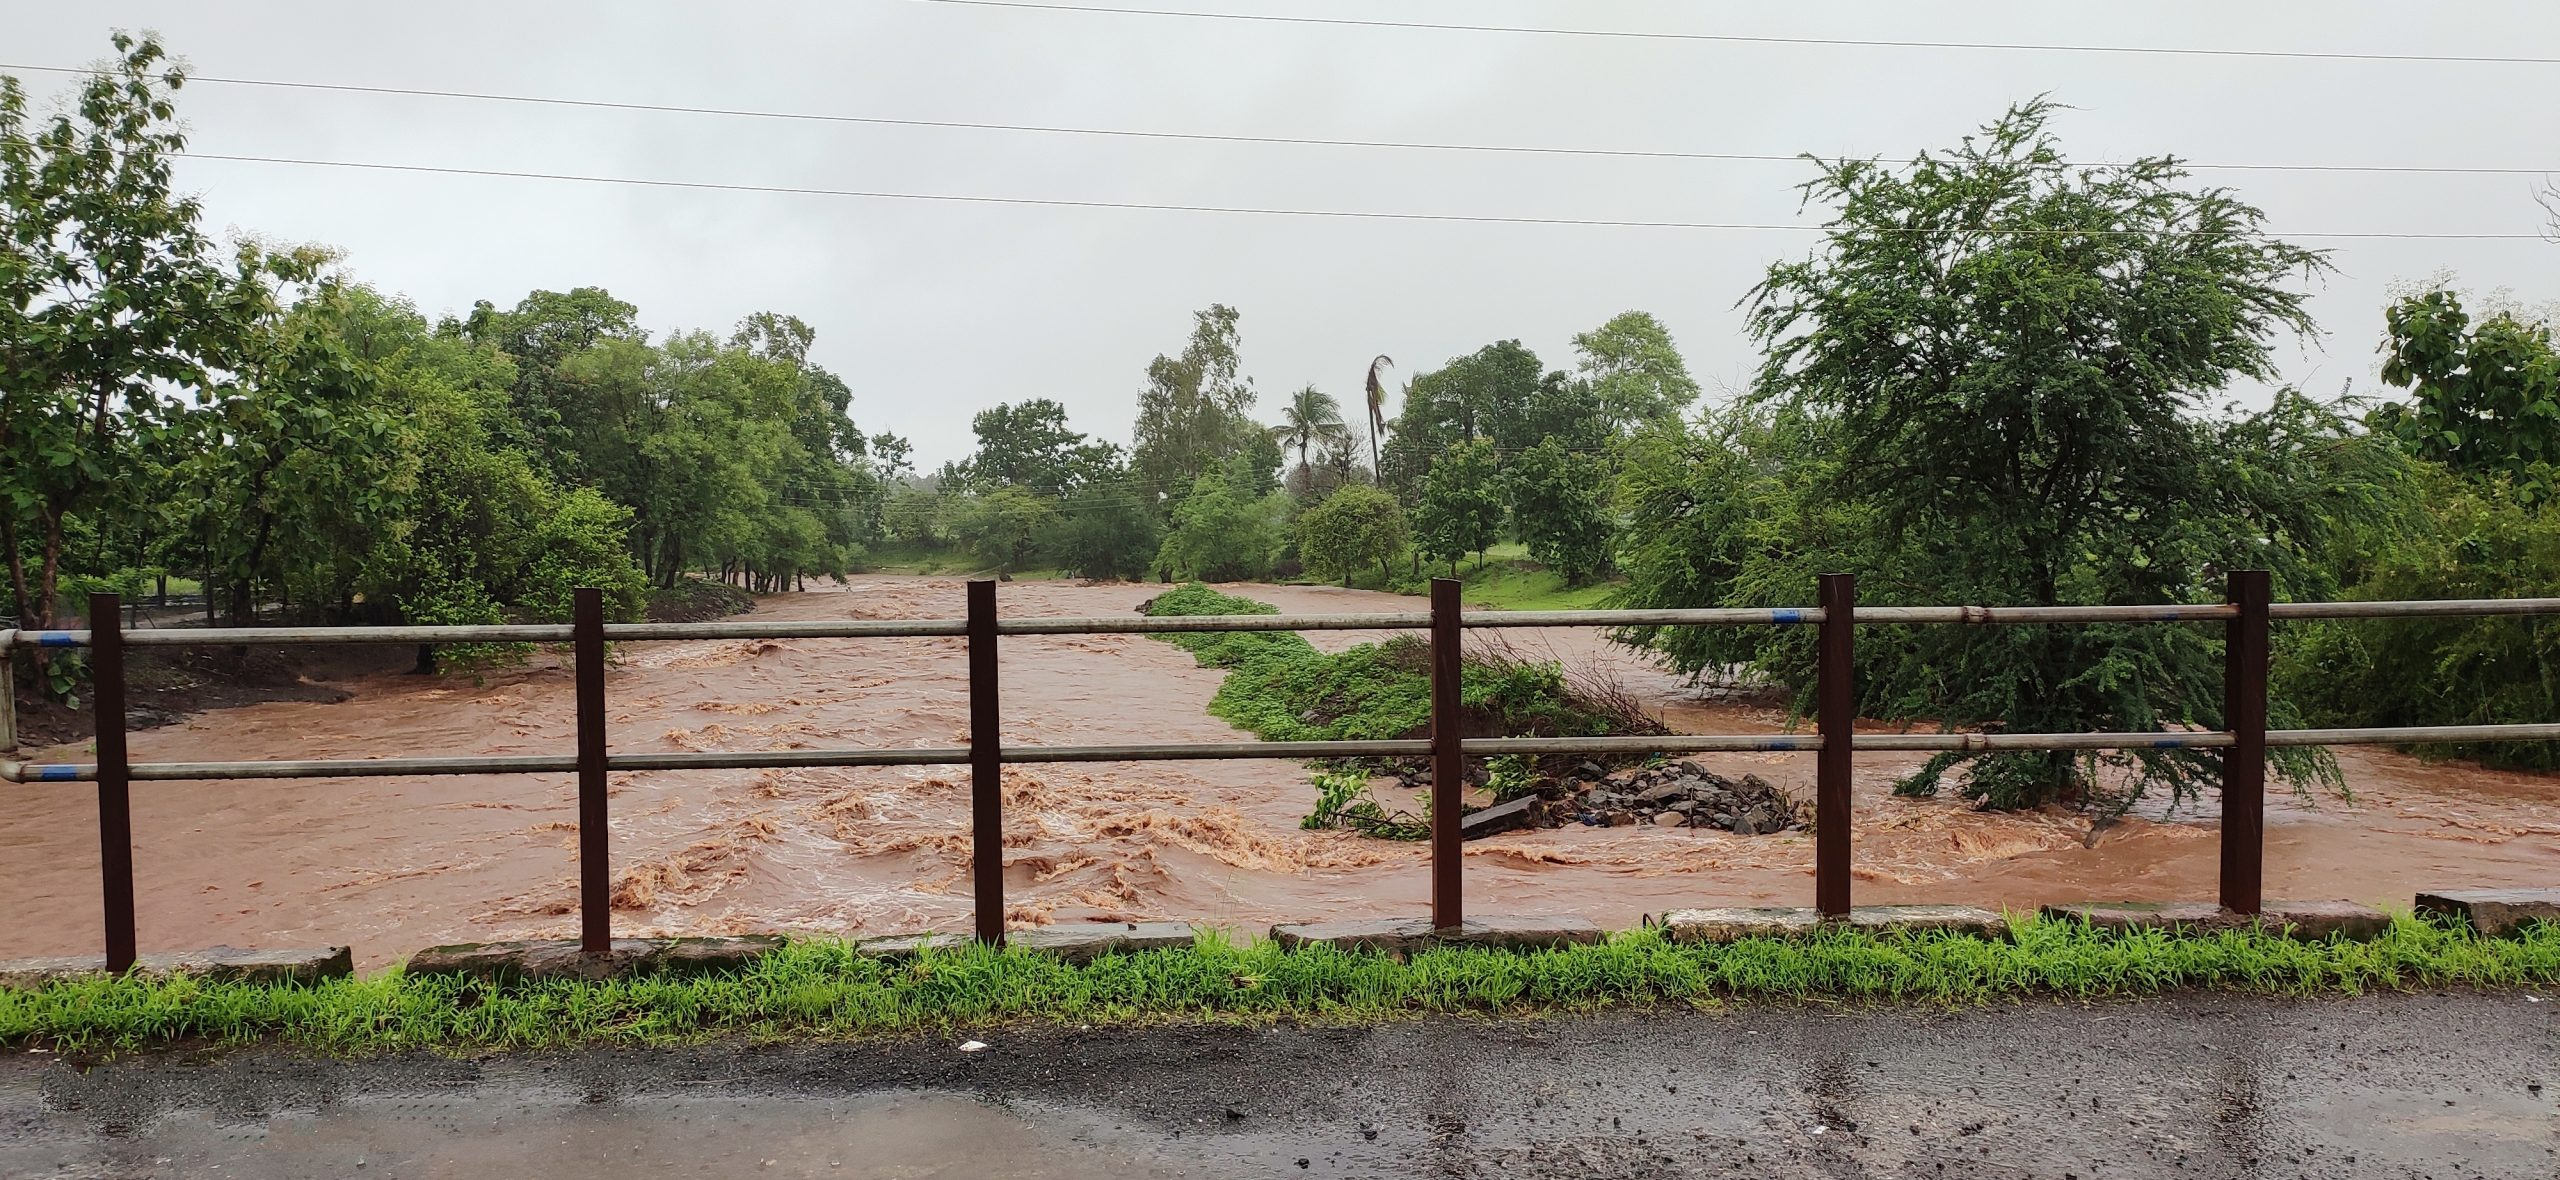 River flooding and a bridge railing